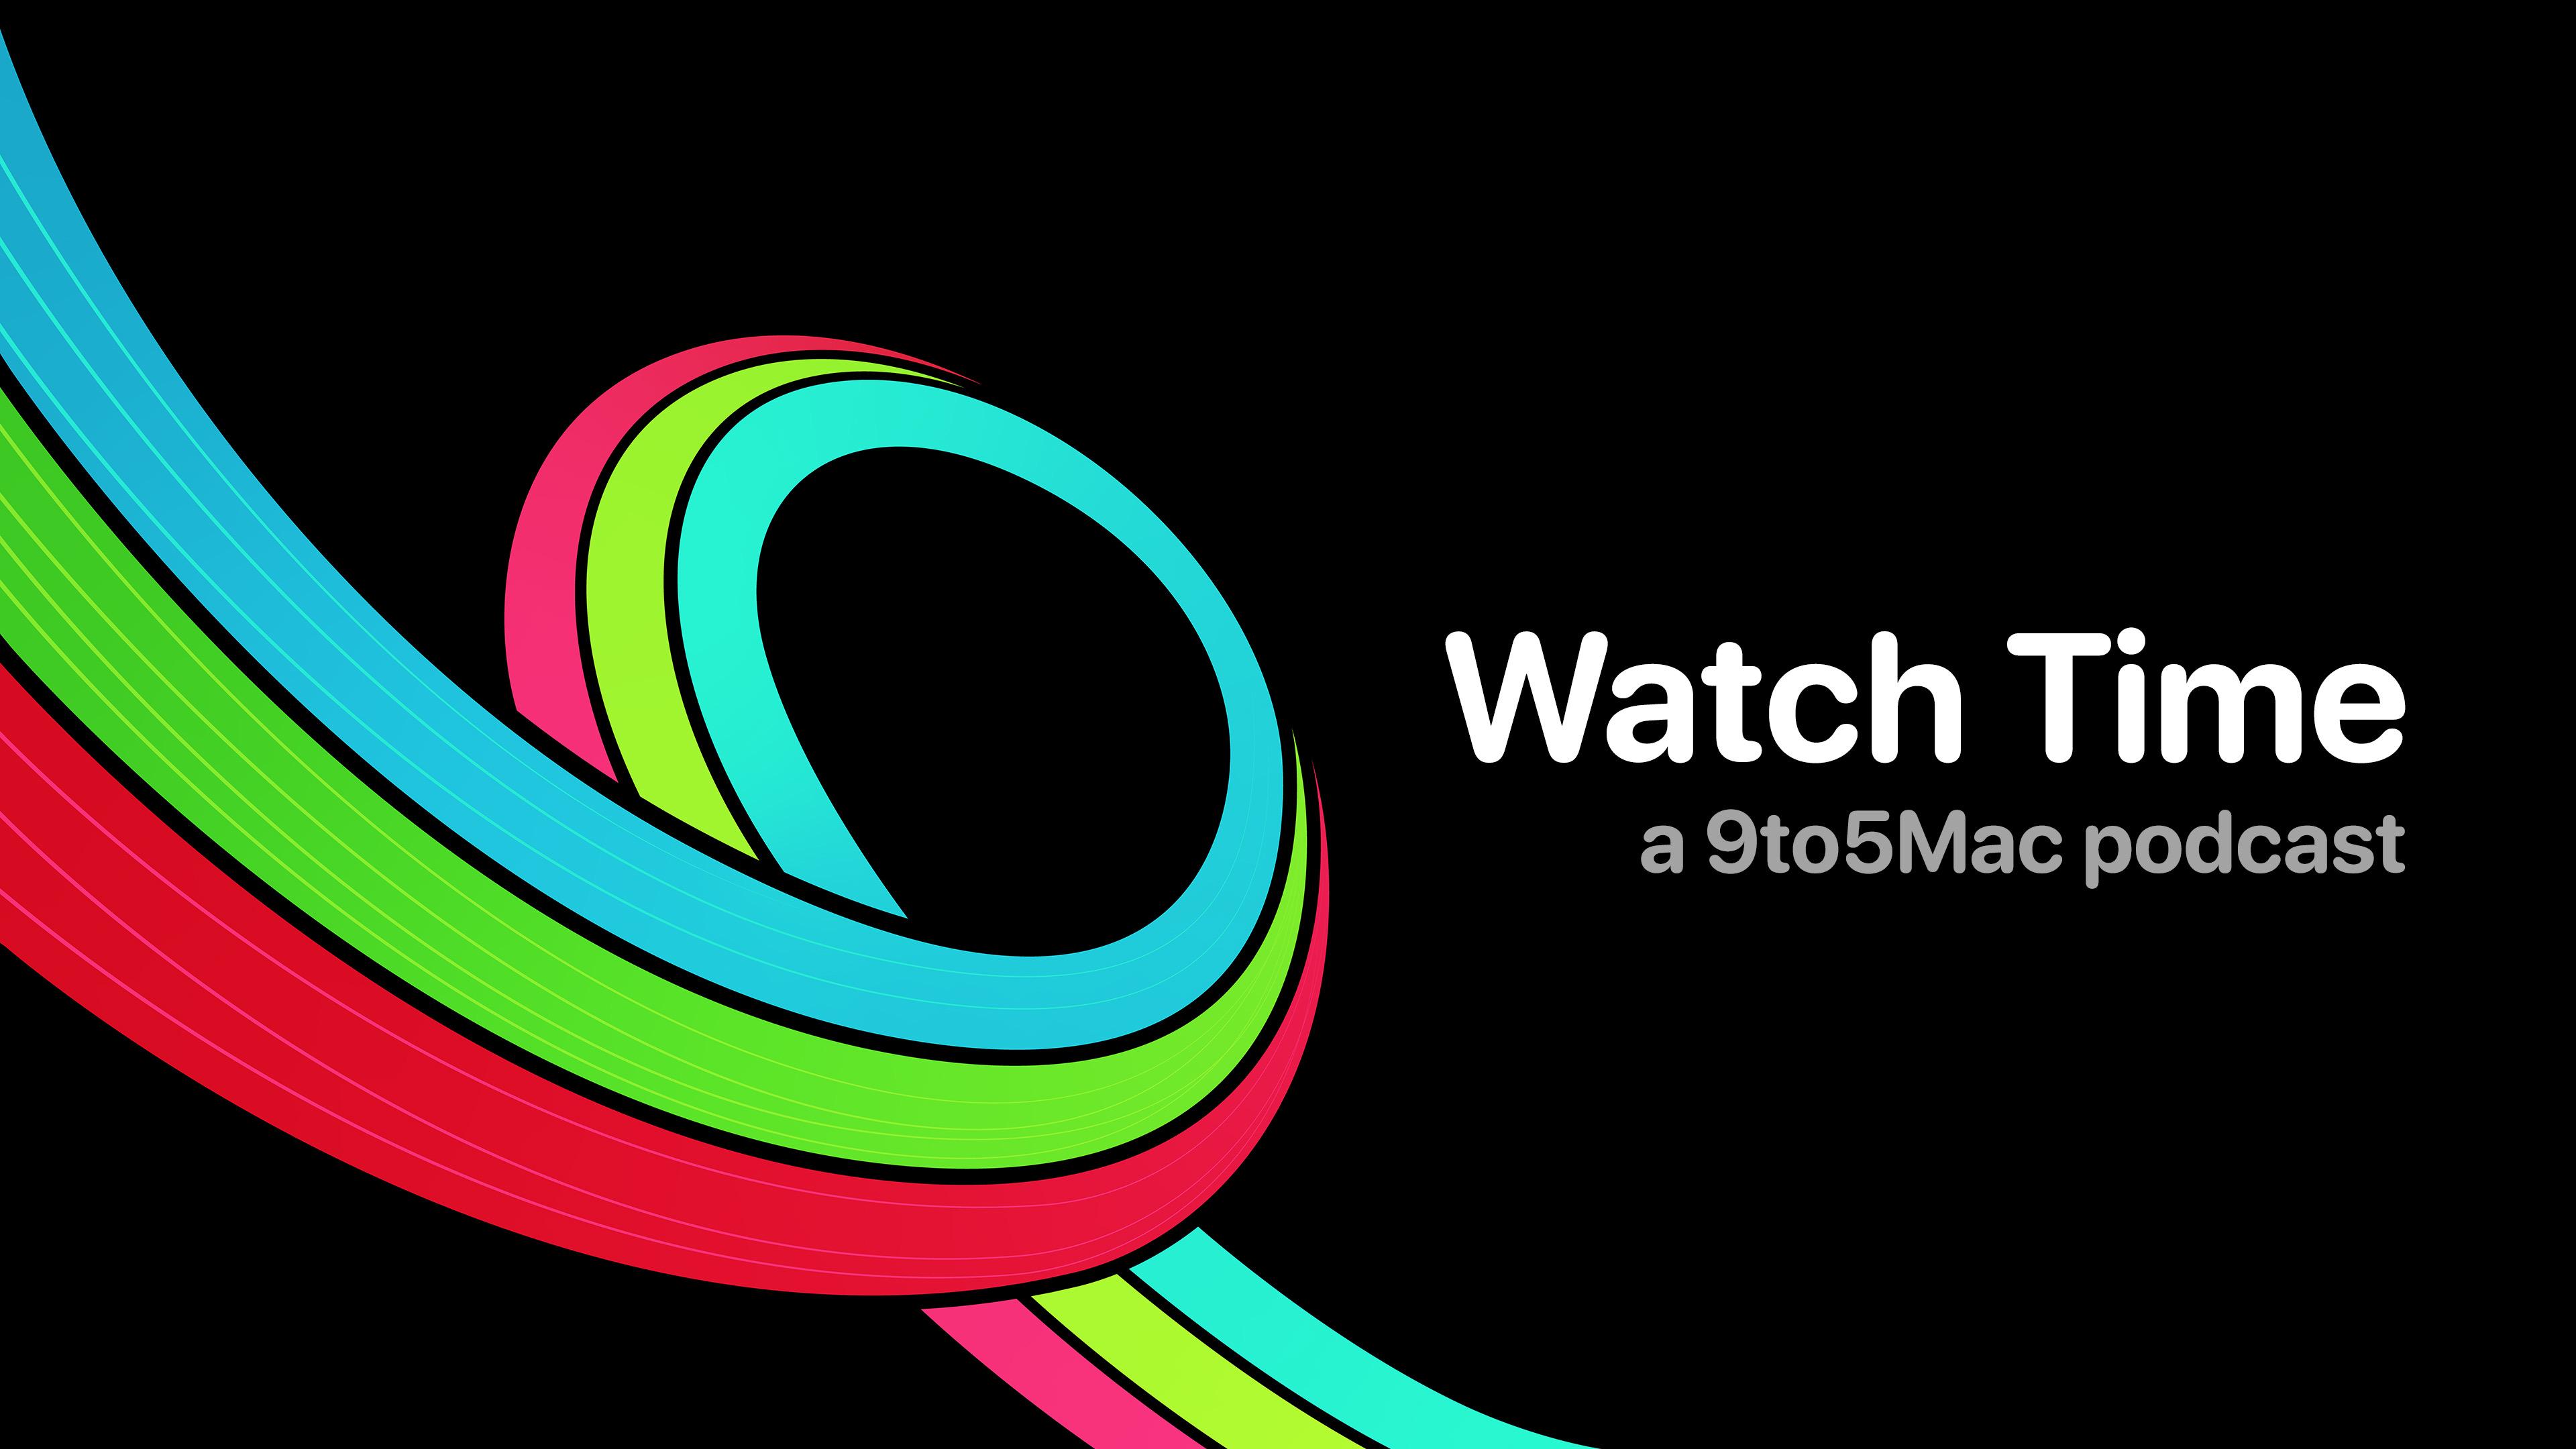 9to5Mac Watch Time: Week 2